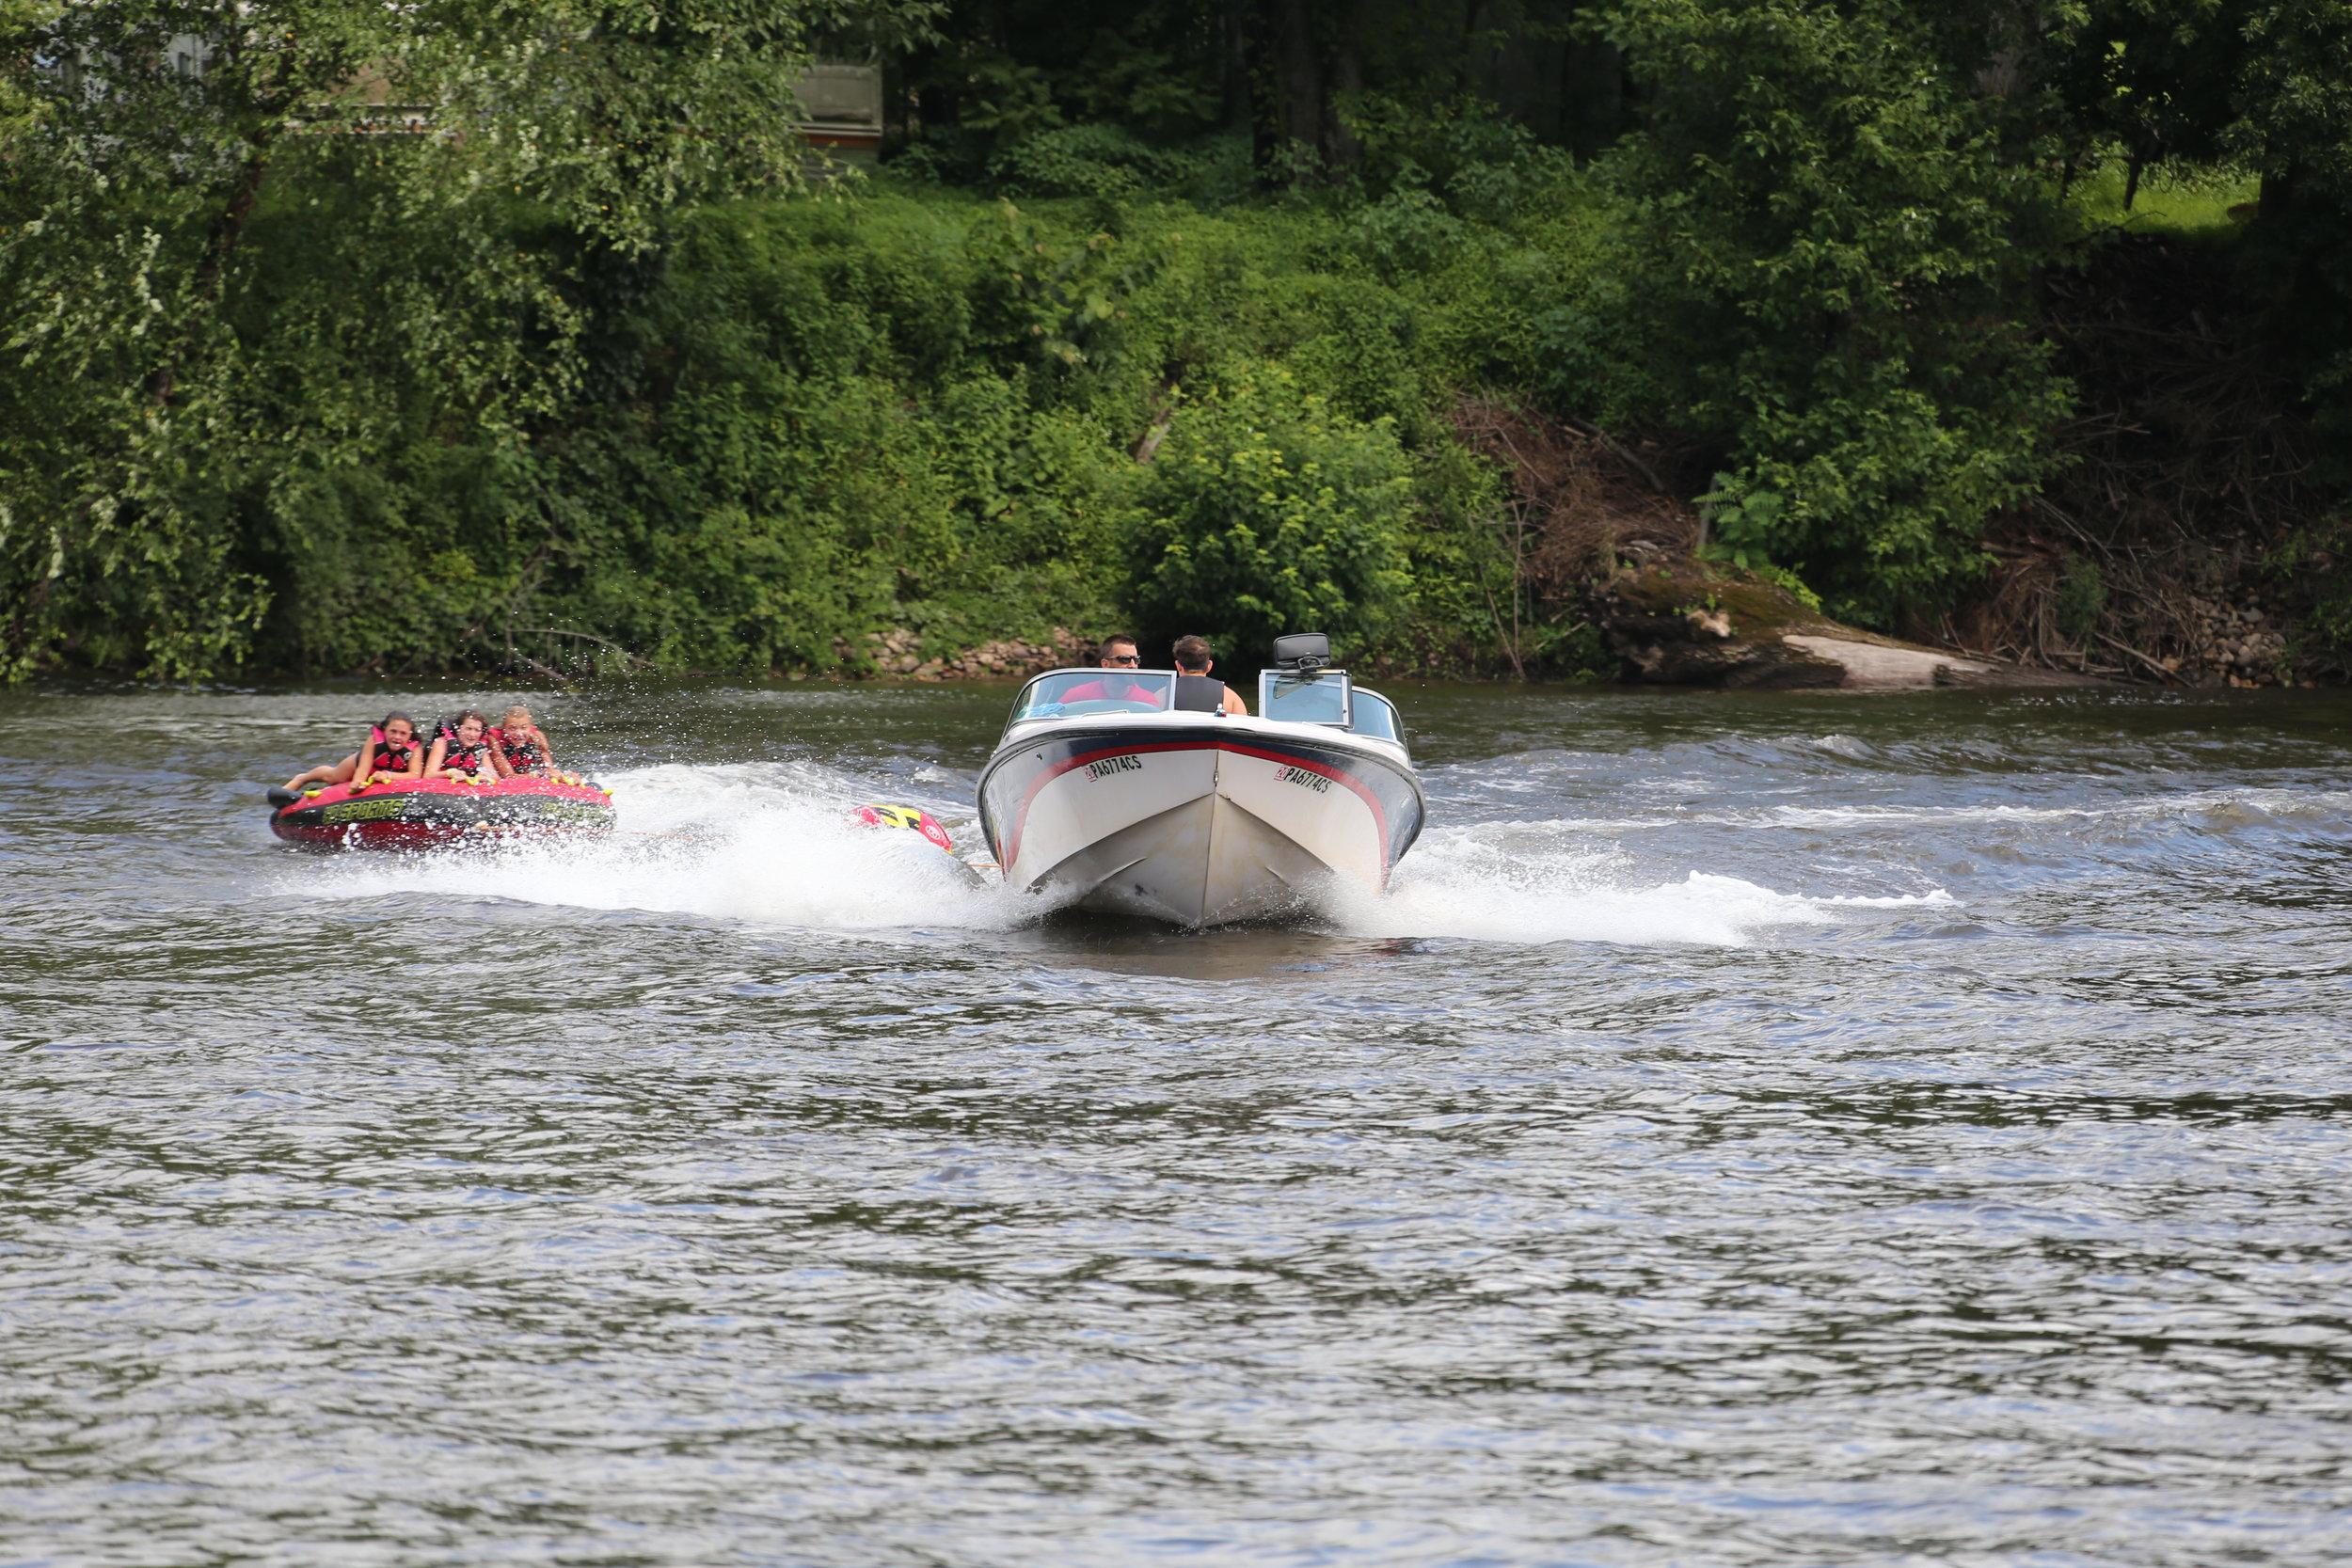 Seasonal river activities